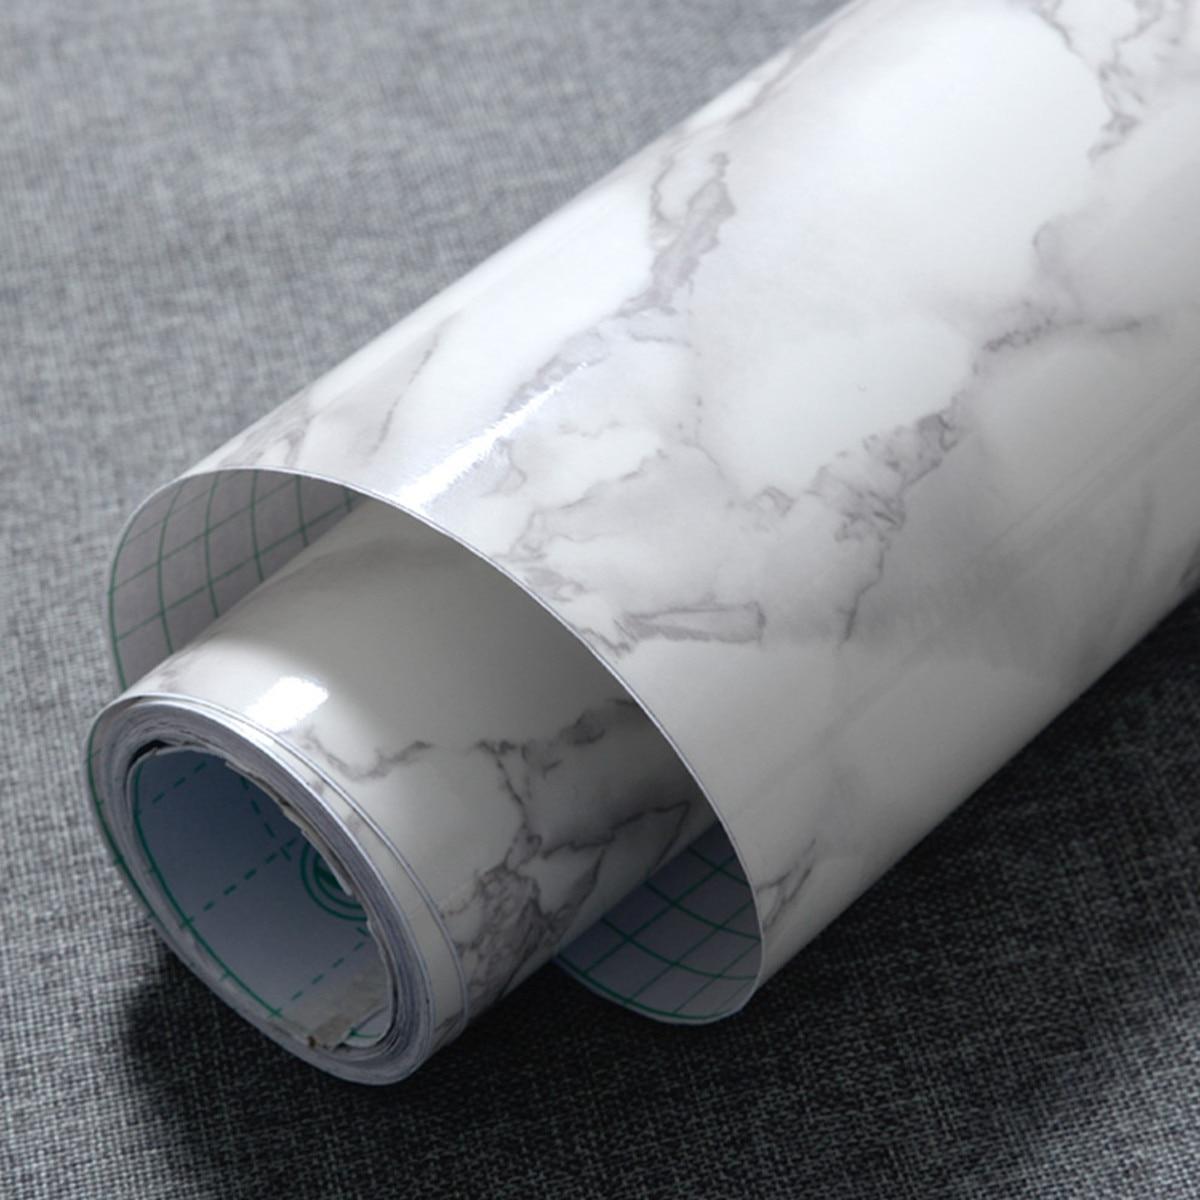 Roll Self Adhesive Wallpaper Granite Marble Texture Wallpaper Self Adhesive Sticker Rolling Paper Background Home Decor 60x50cm